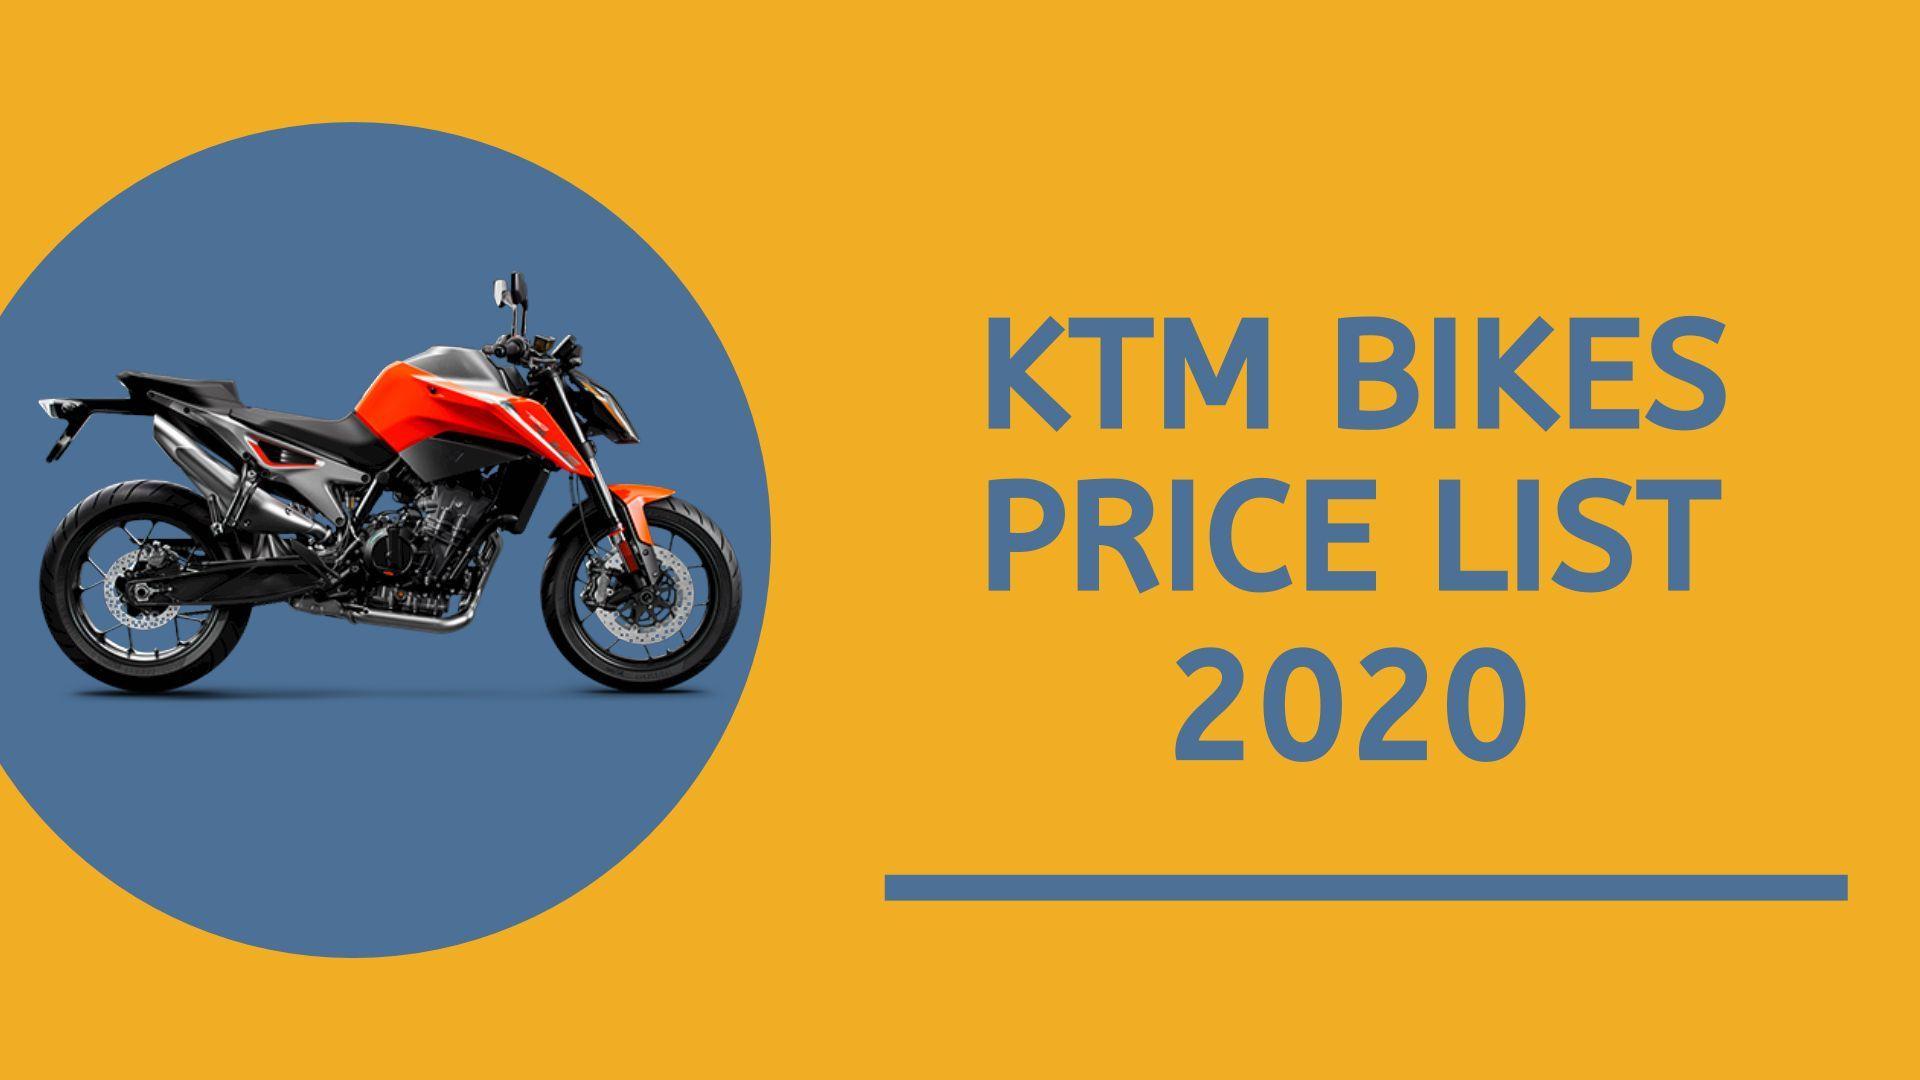 Ktm Bikes Price List 2020 Checkout Ktm Bike Price In India Latest Models Ktm Bike Price Bike Prices Ktm